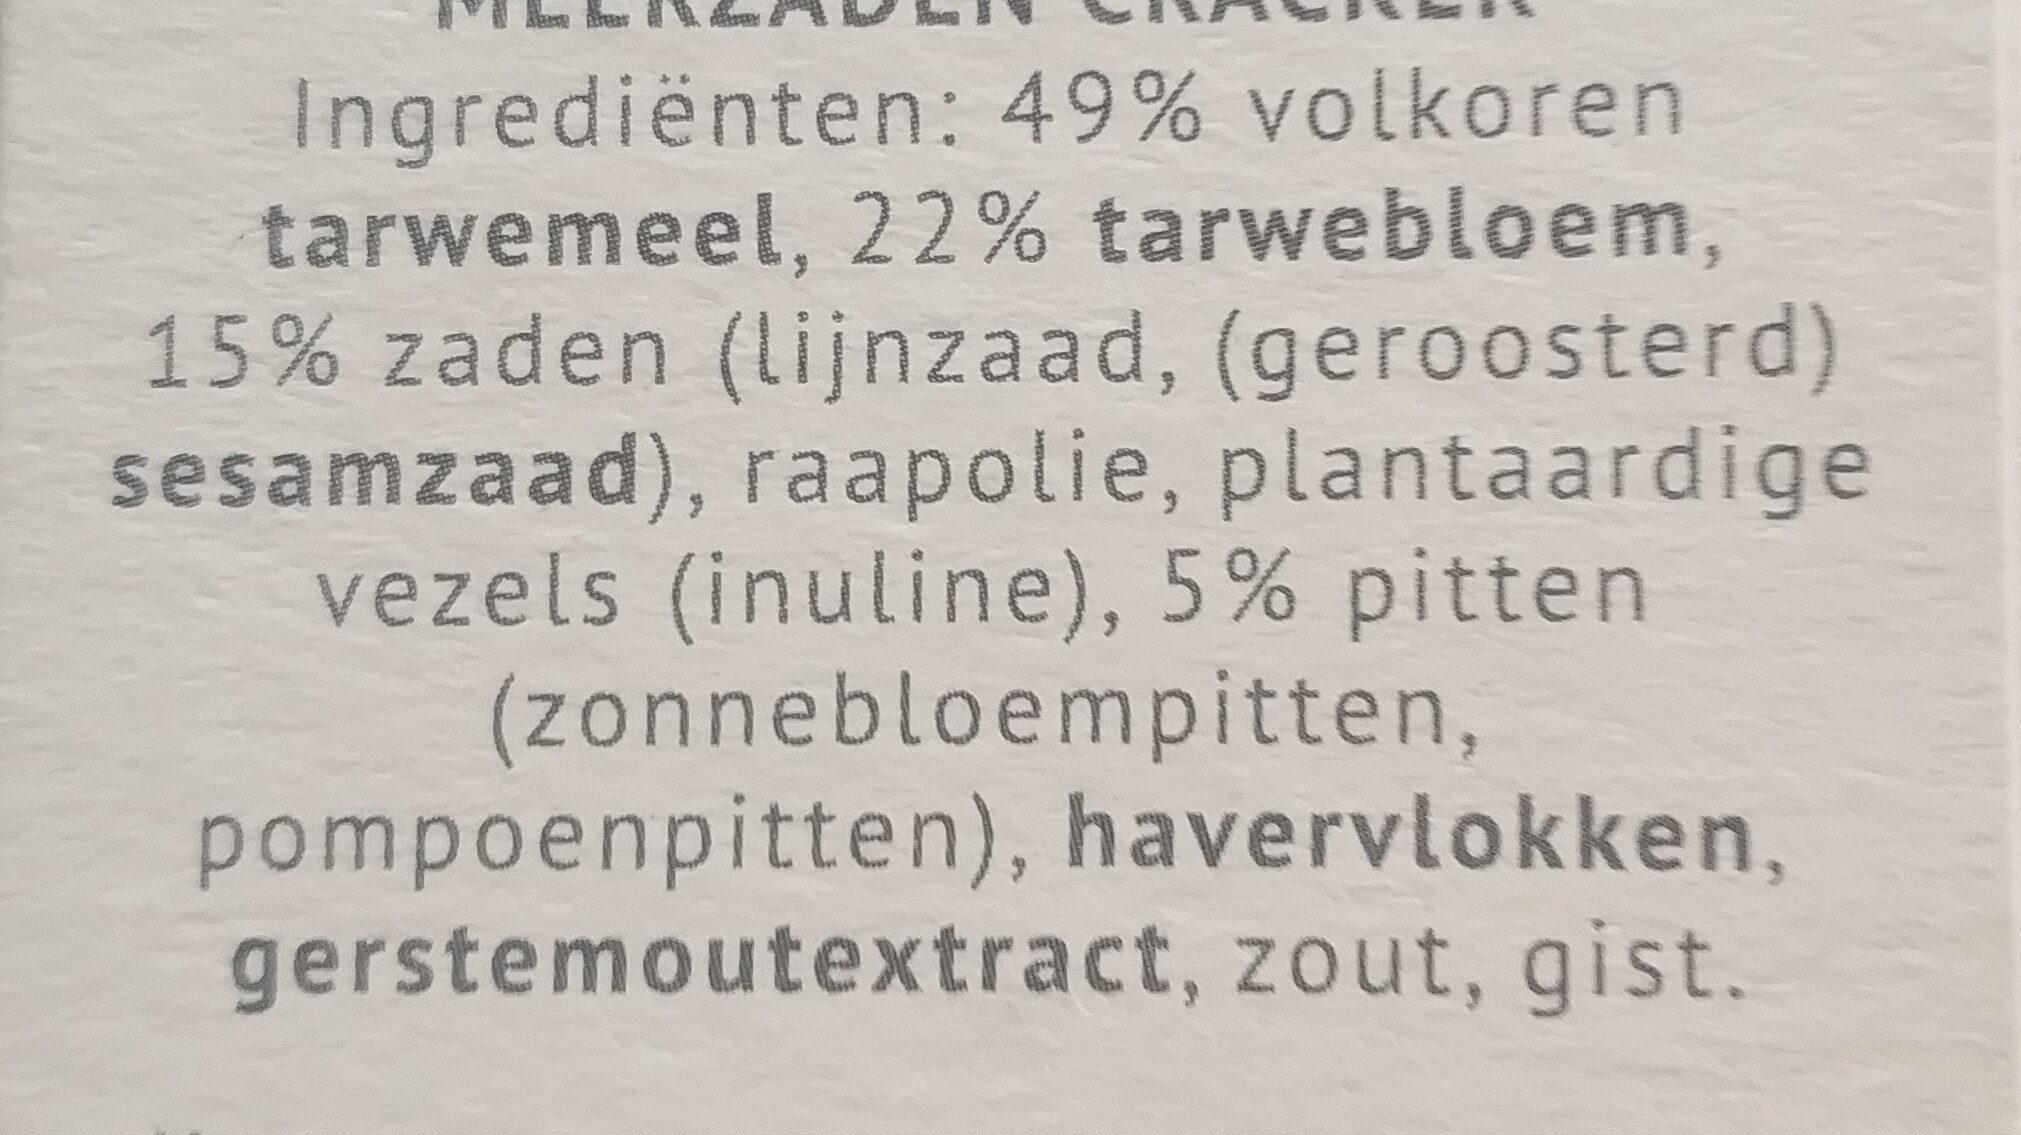 Ontbijtcrackers - Ingredienti - nl